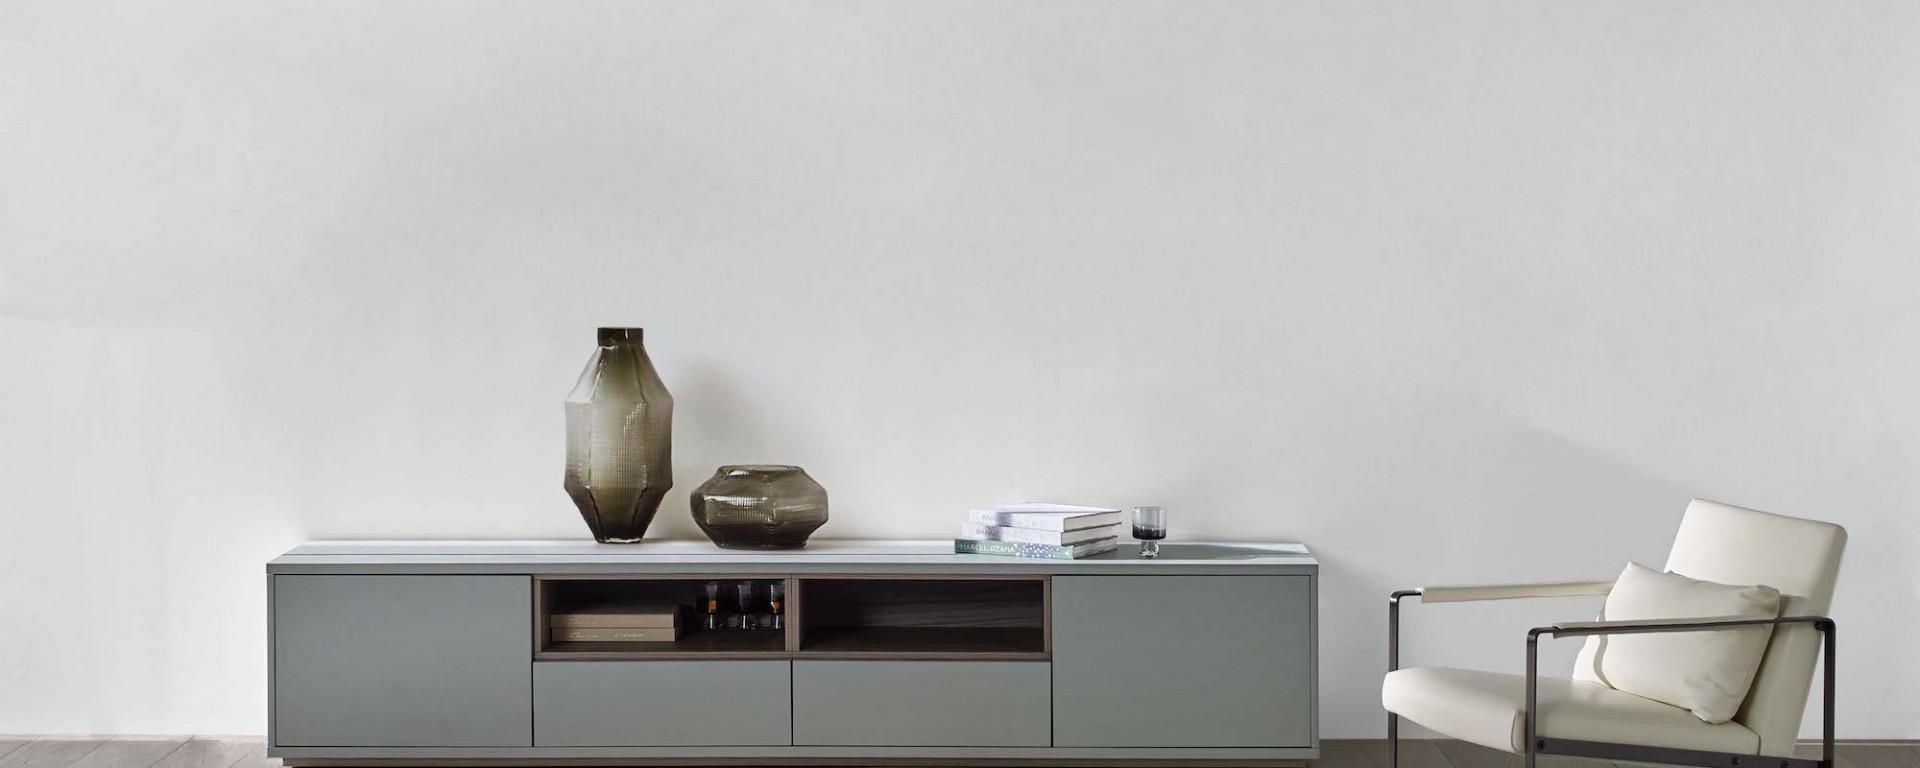 Camerich Leman Small Designer Lounge Chair furniture - Copse House Magazine